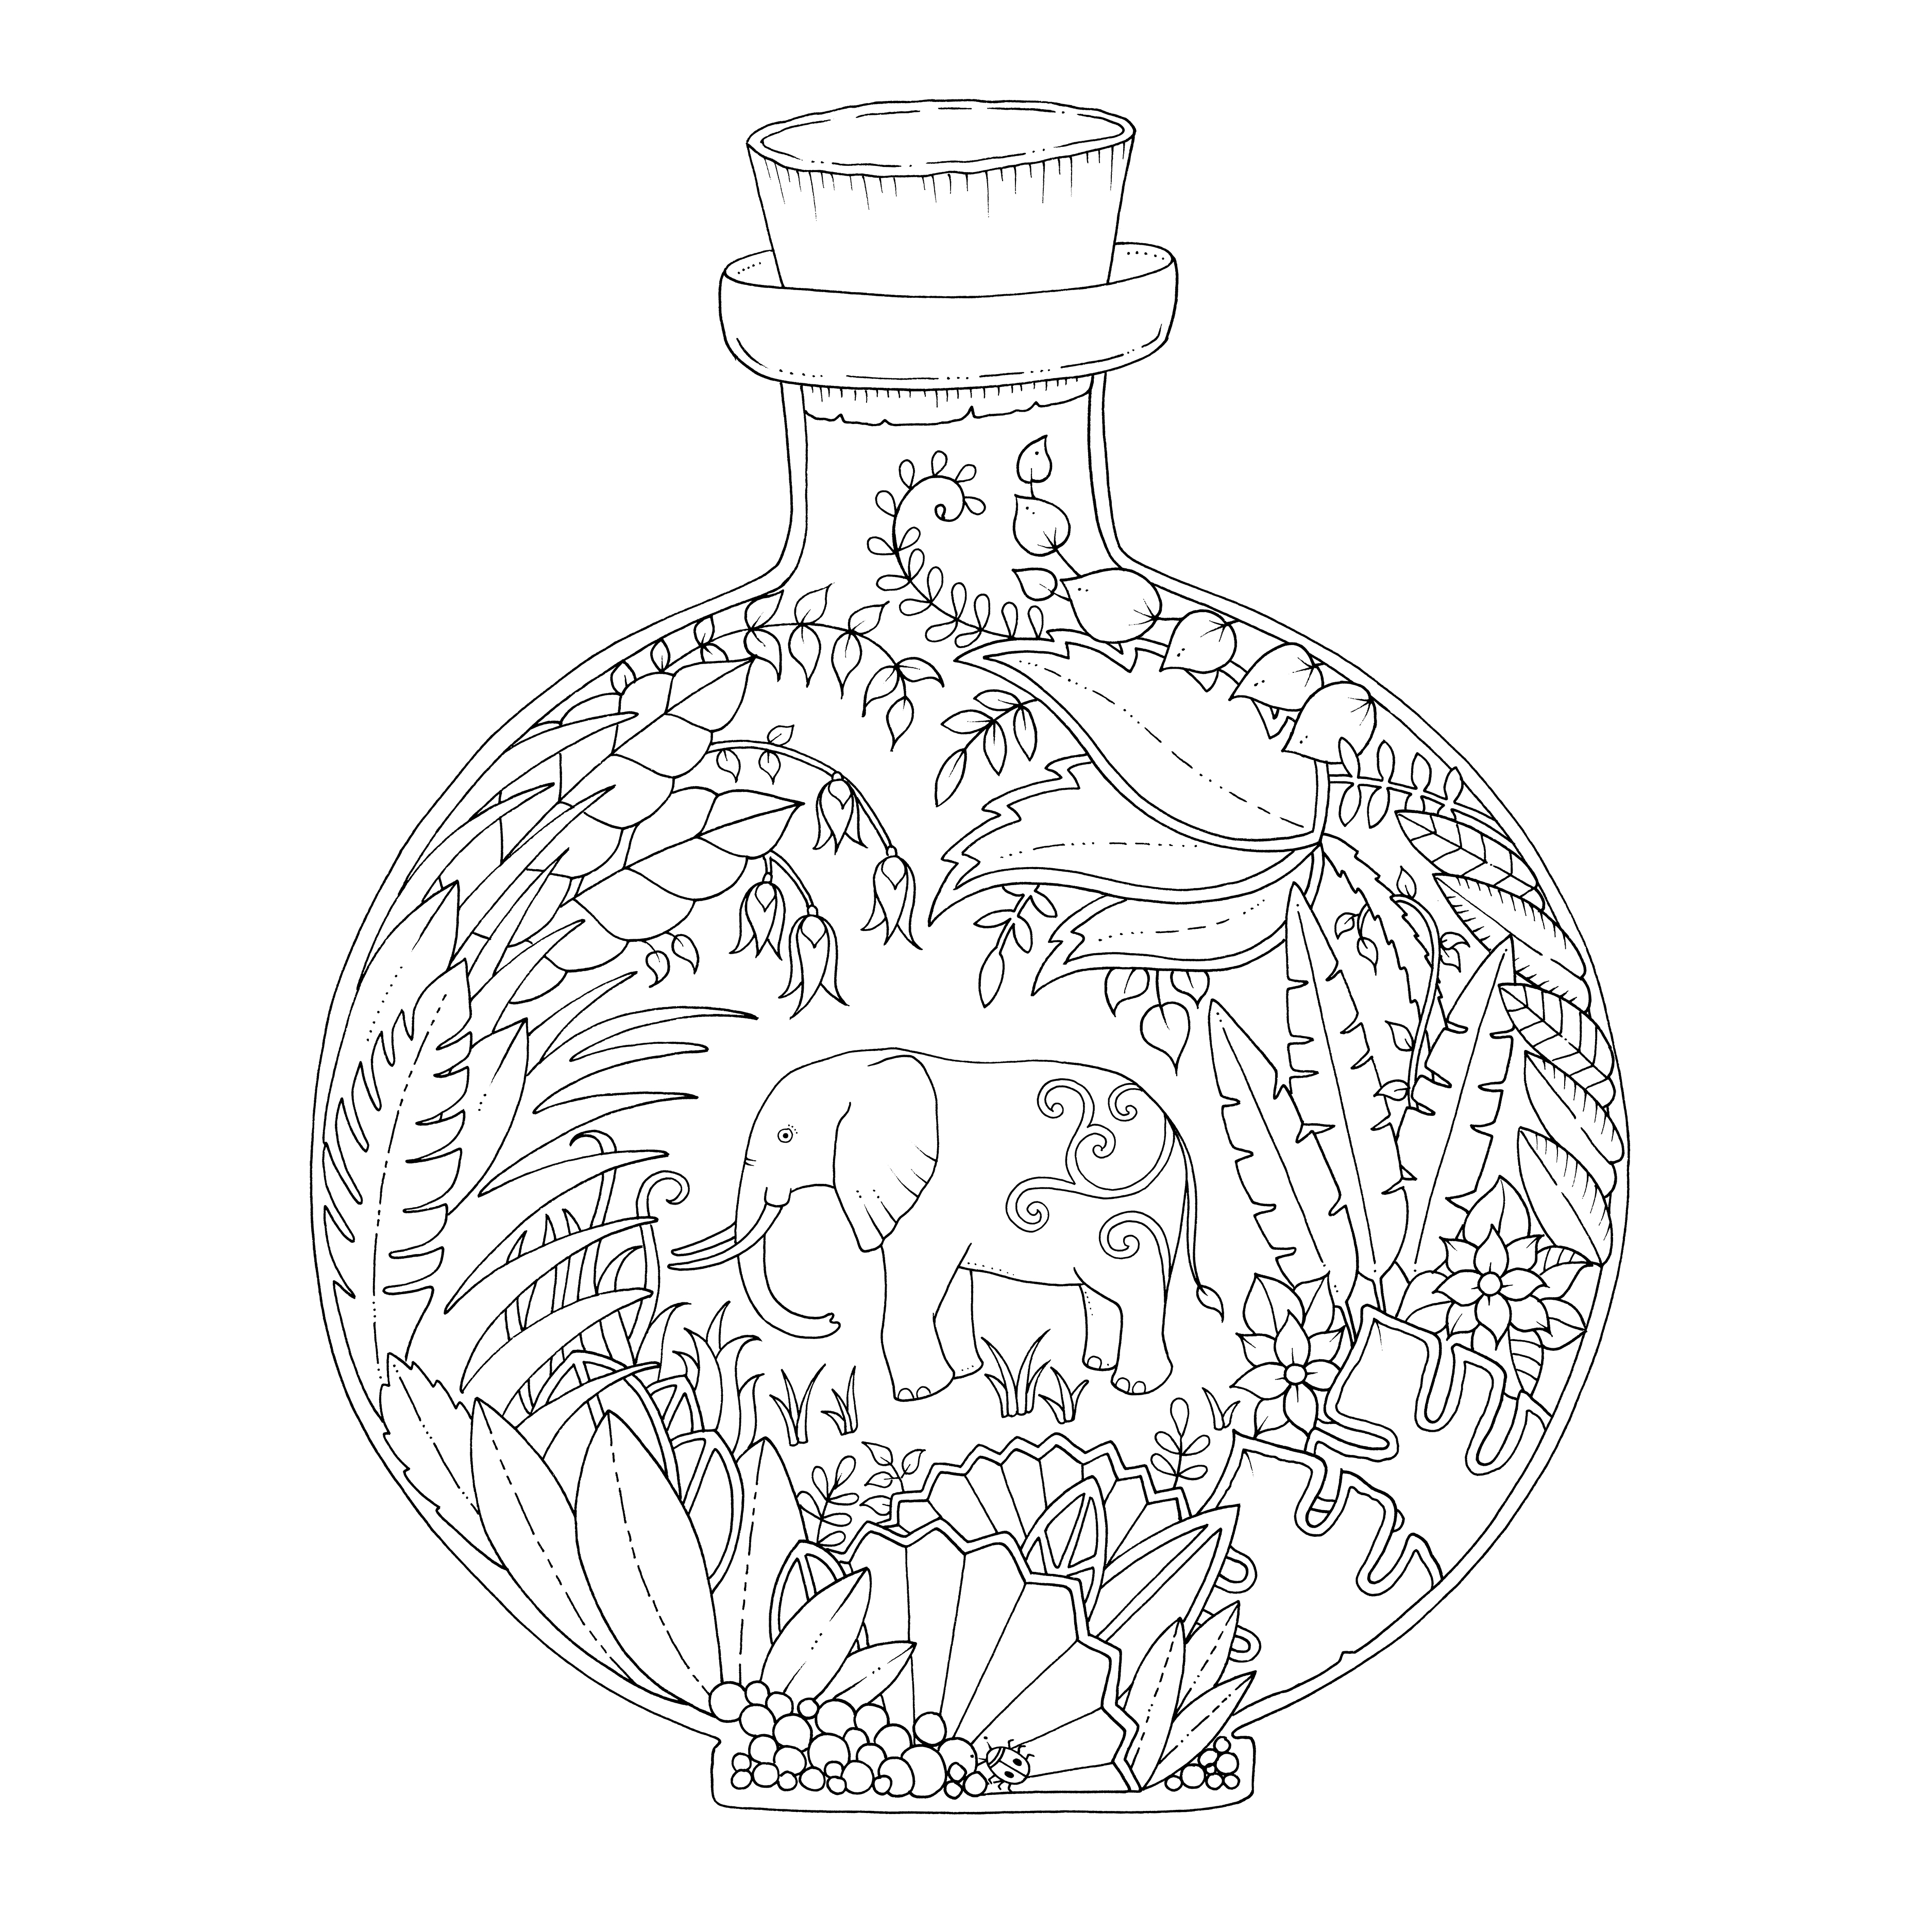 Раскраска антистресс джоанна басфорд джунгли